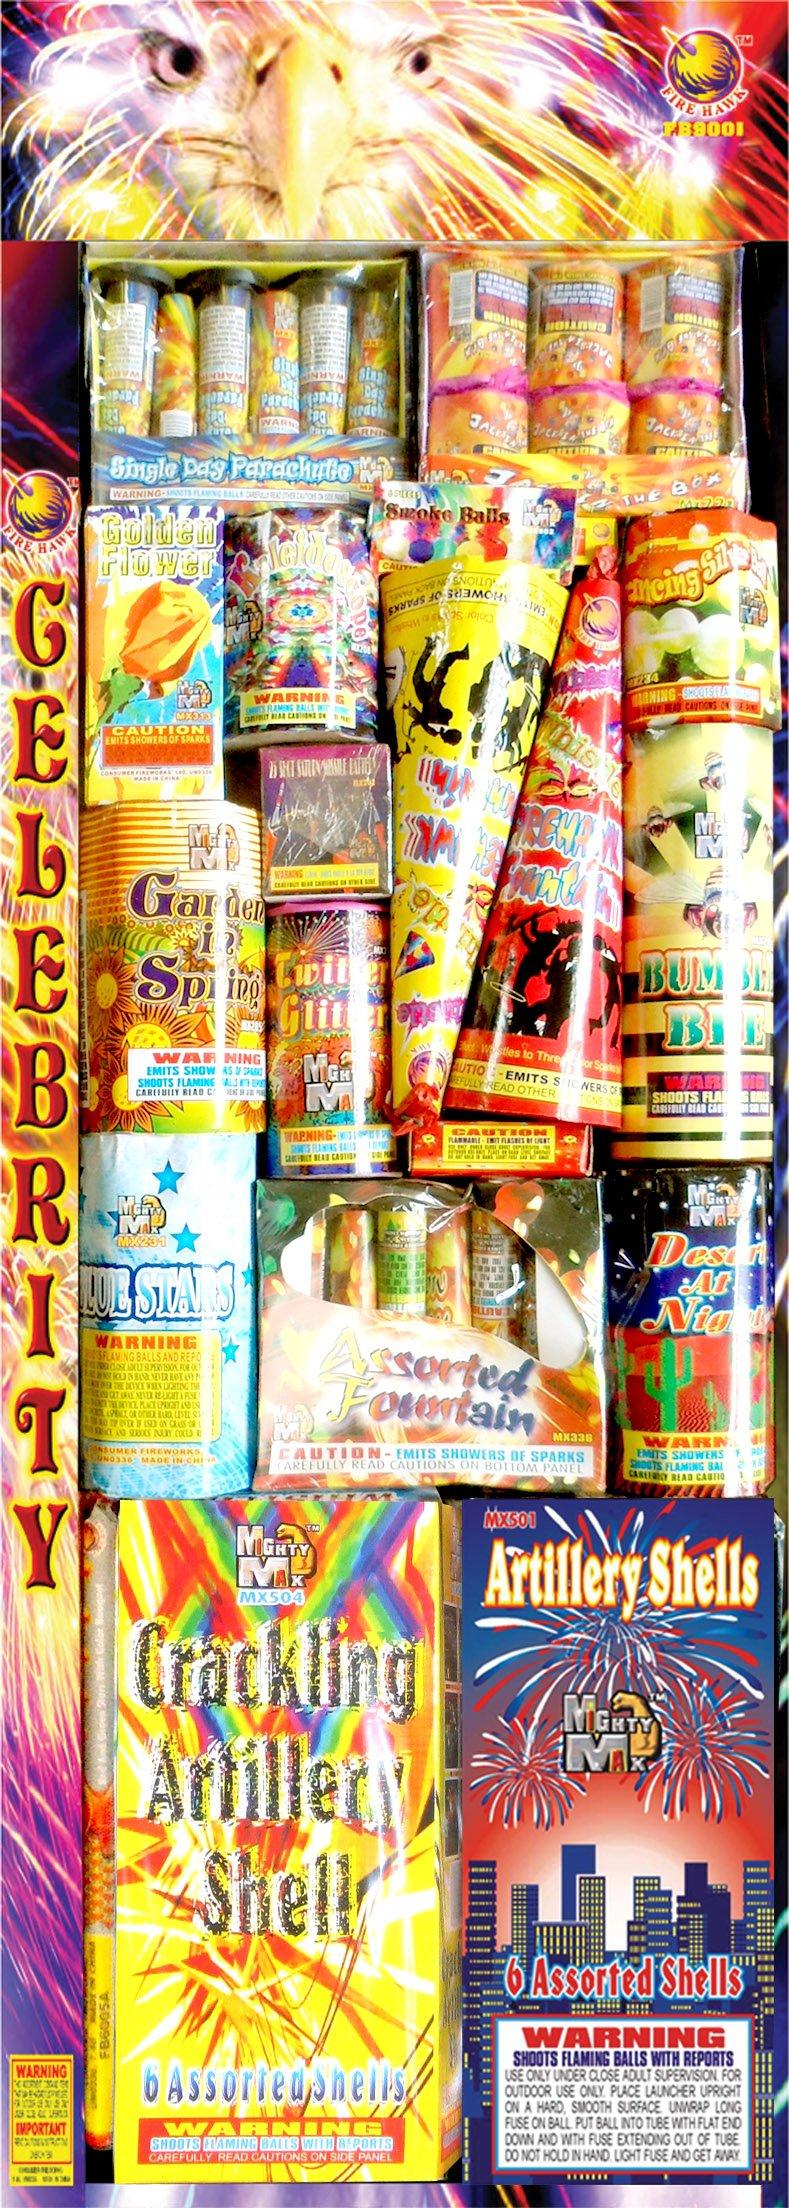 Fireworks Training Course | KCs Fireworks Displays